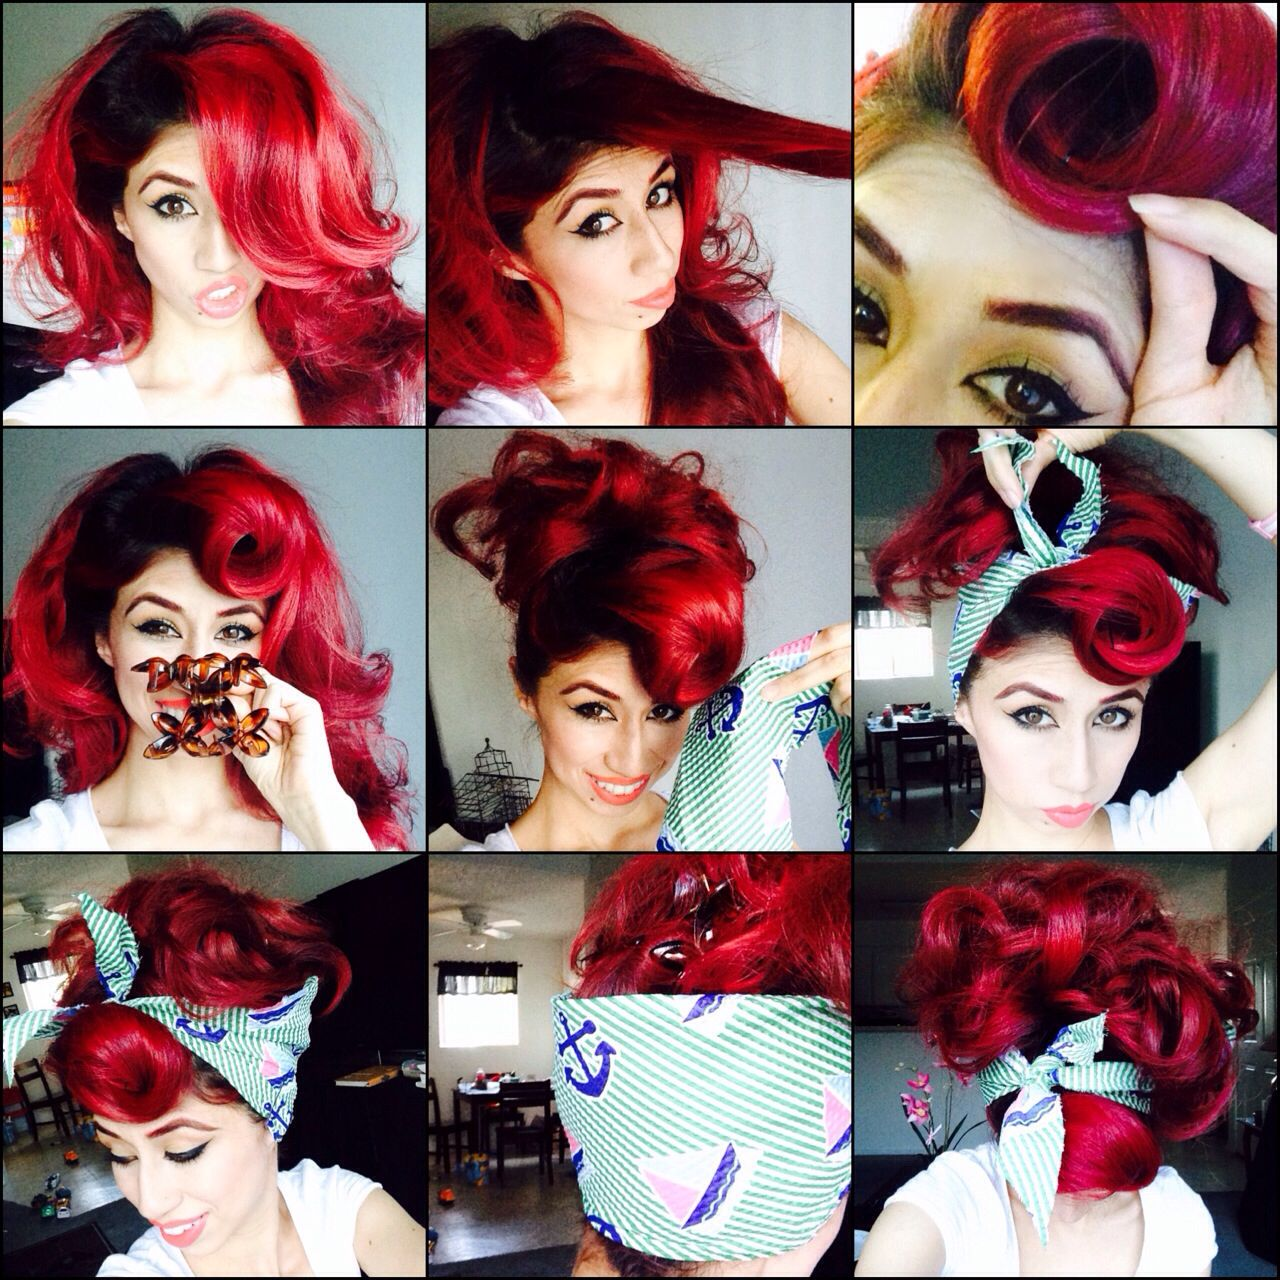 rockabilly hair. pinup hair. bad hair day hair style. 1